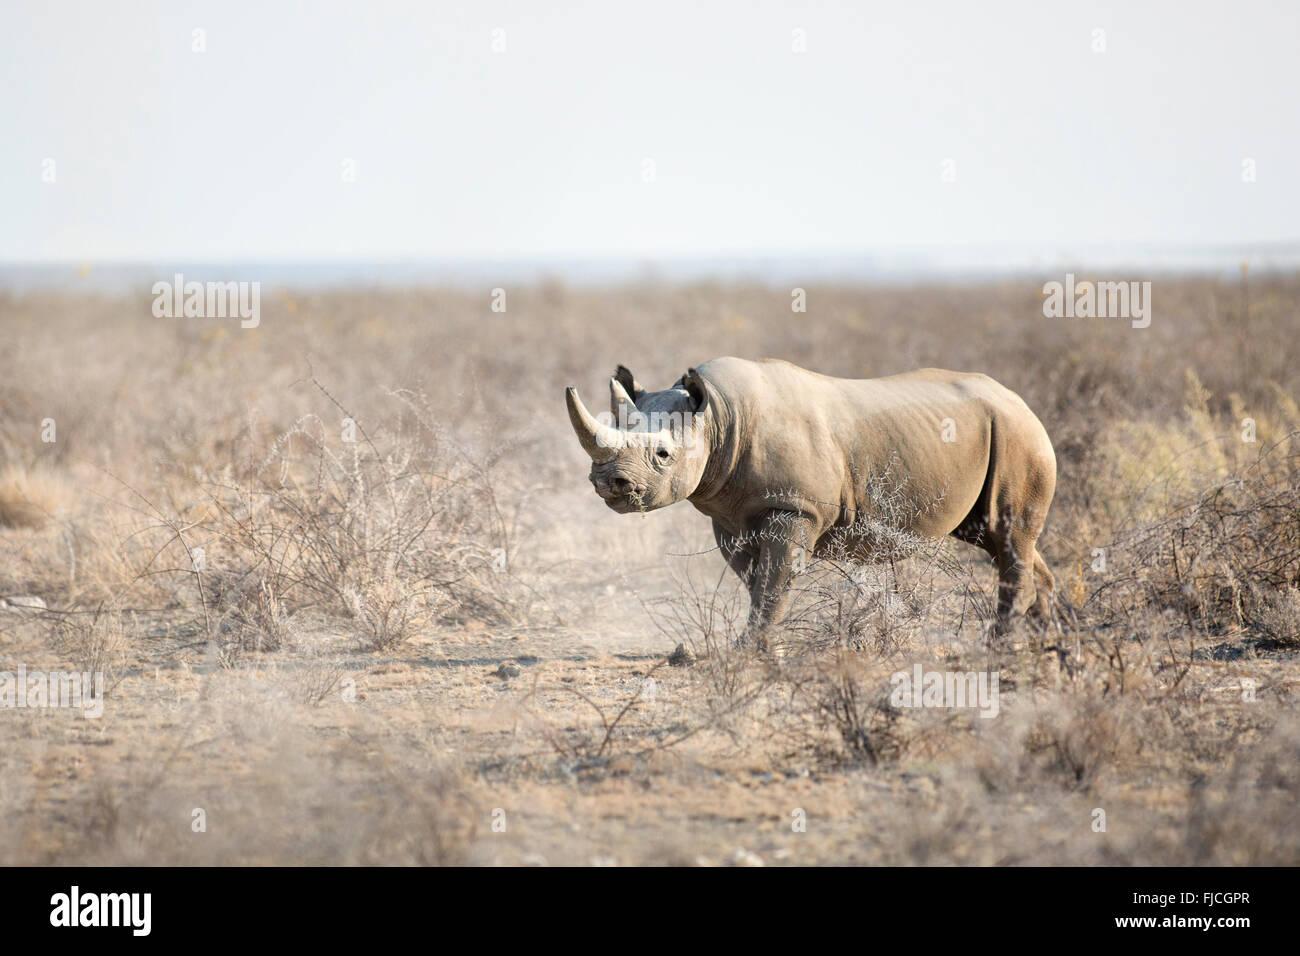 Un rhinocéros noir Photo Stock